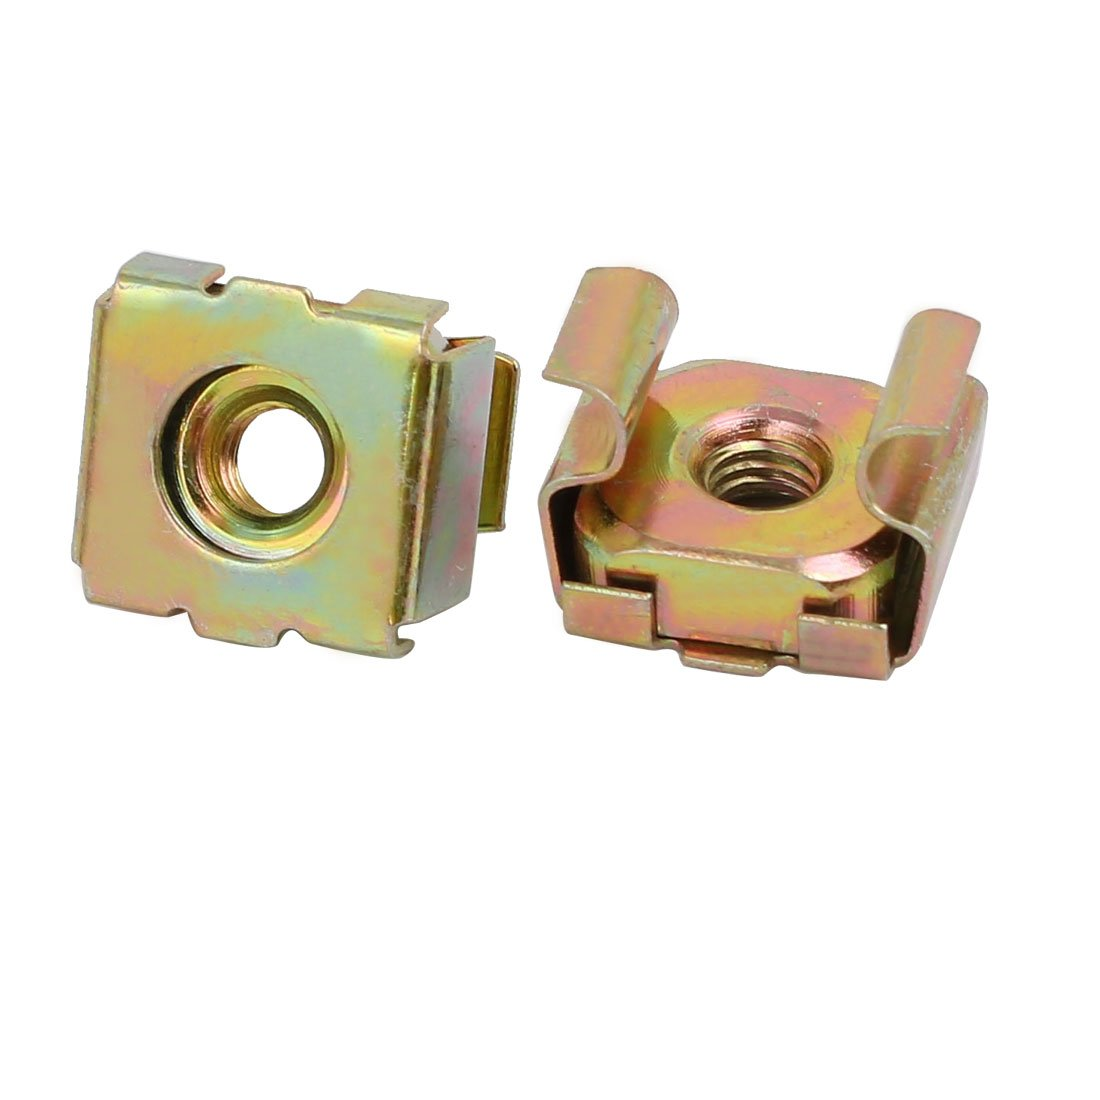 Sourcingmap/® 20pcs M4 Carbon Steel Captive Cage Nut Brass Tone for Server Shelf Cabinet